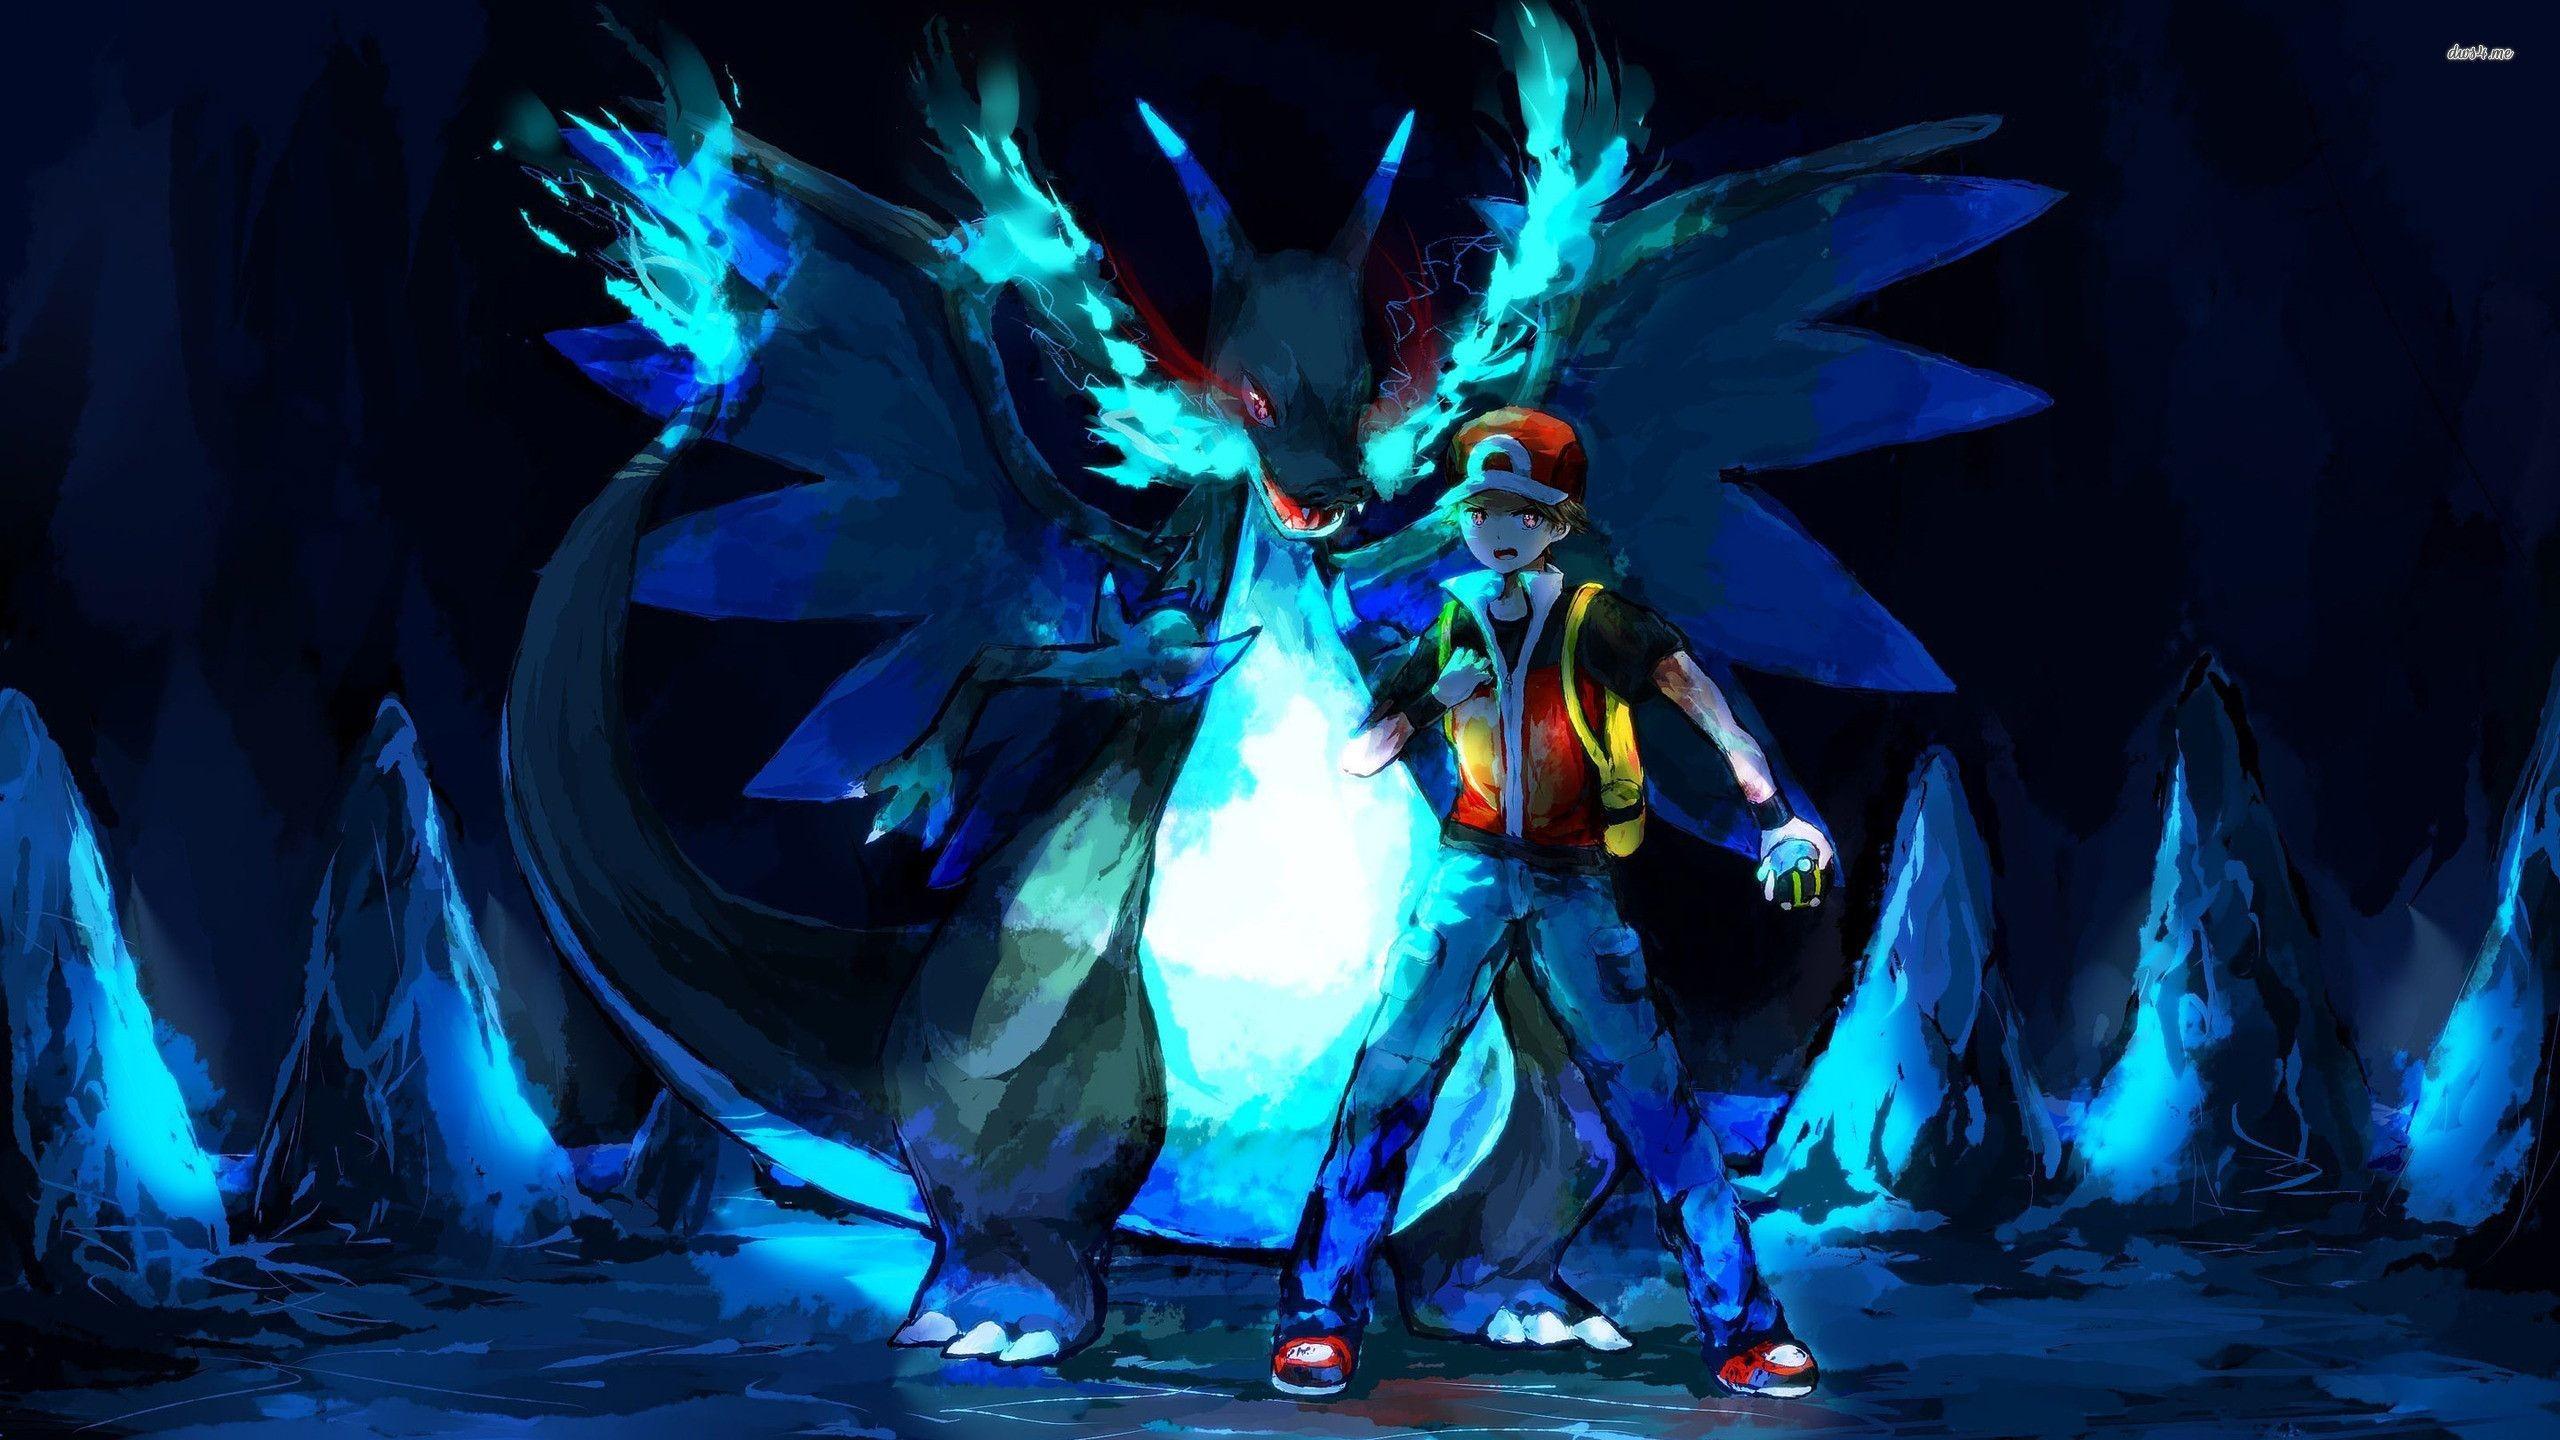 Pokemon Mega Charizard X Wallpaper 80 Images